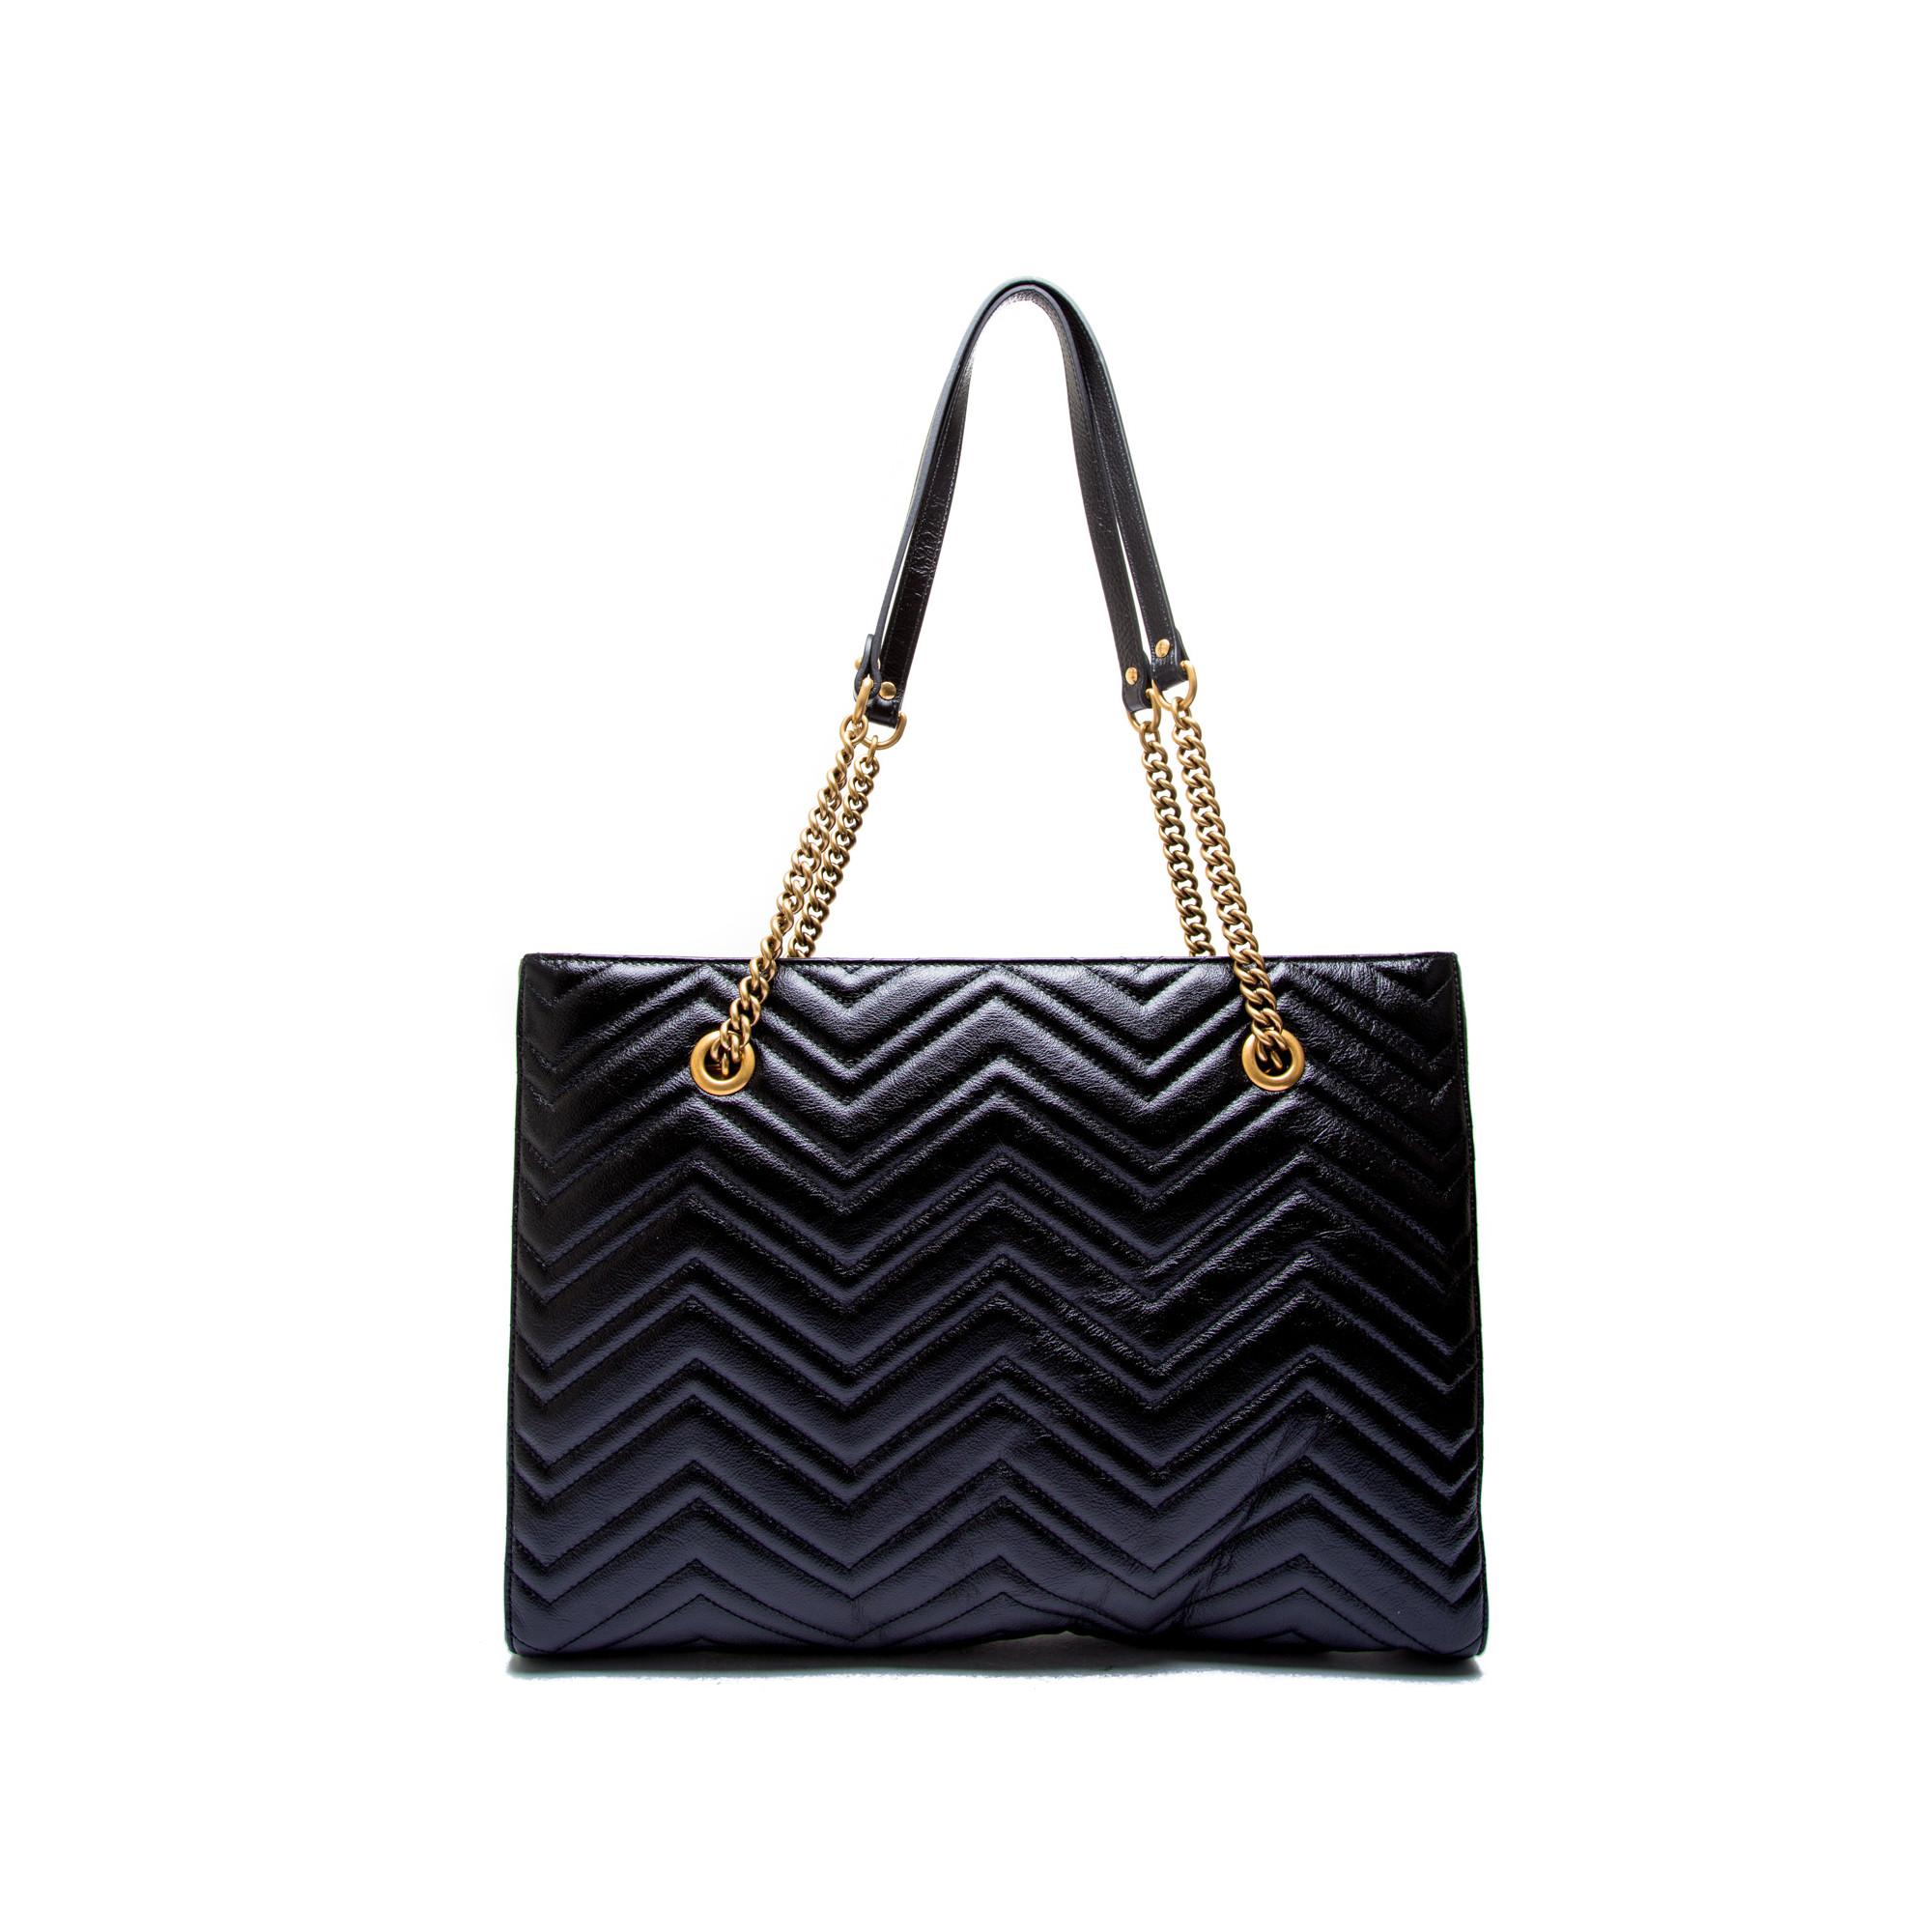 370bb0620b5e Gucci handbag marmont pink gucci handbag marmont pink jpg 2000x2000 Gucci  handbag